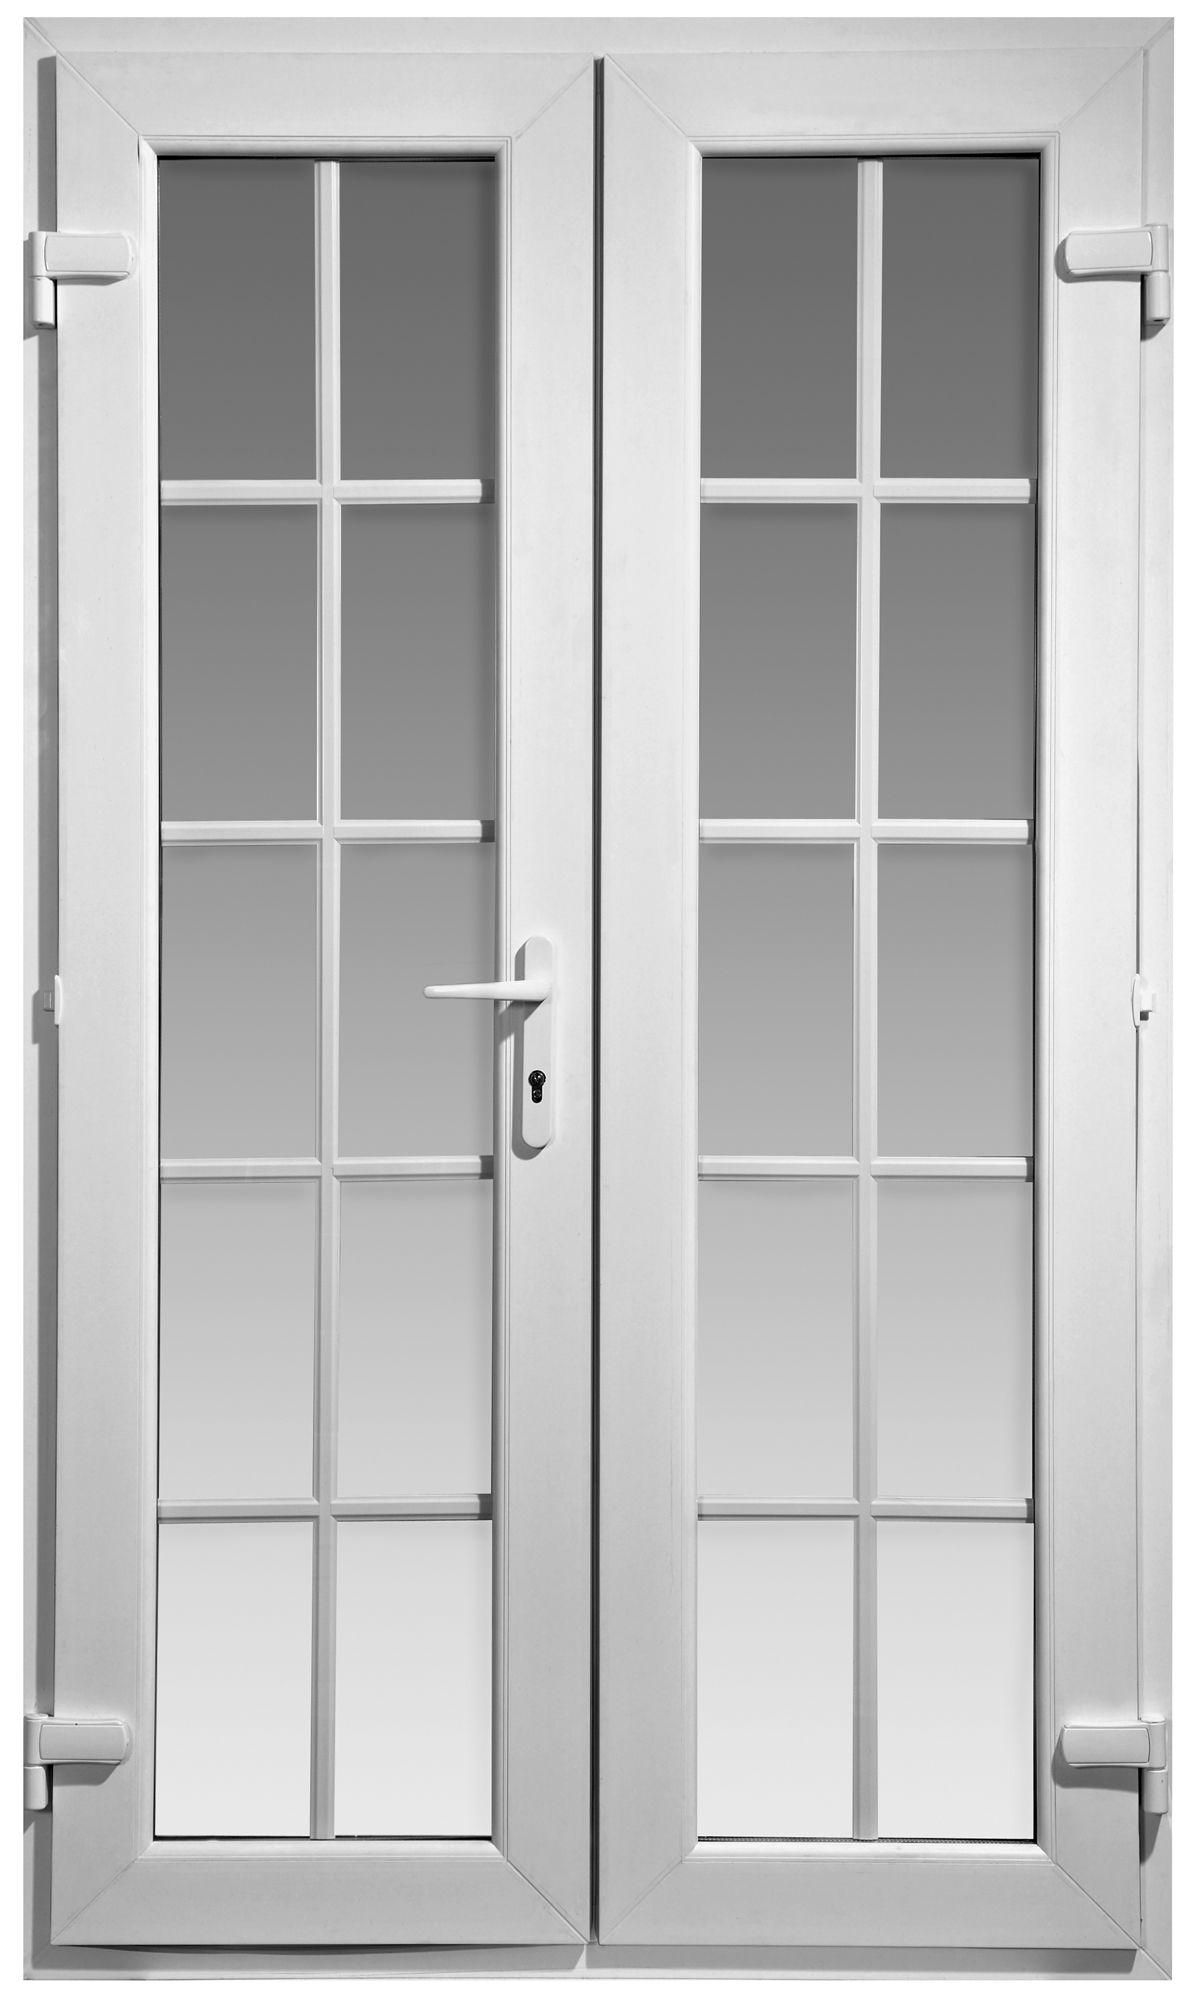 4ft Georgian Clear Glazed PVCu External French Door Set  : 0384664301c from www.diy.com size 1195 x 2000 jpeg 126kB